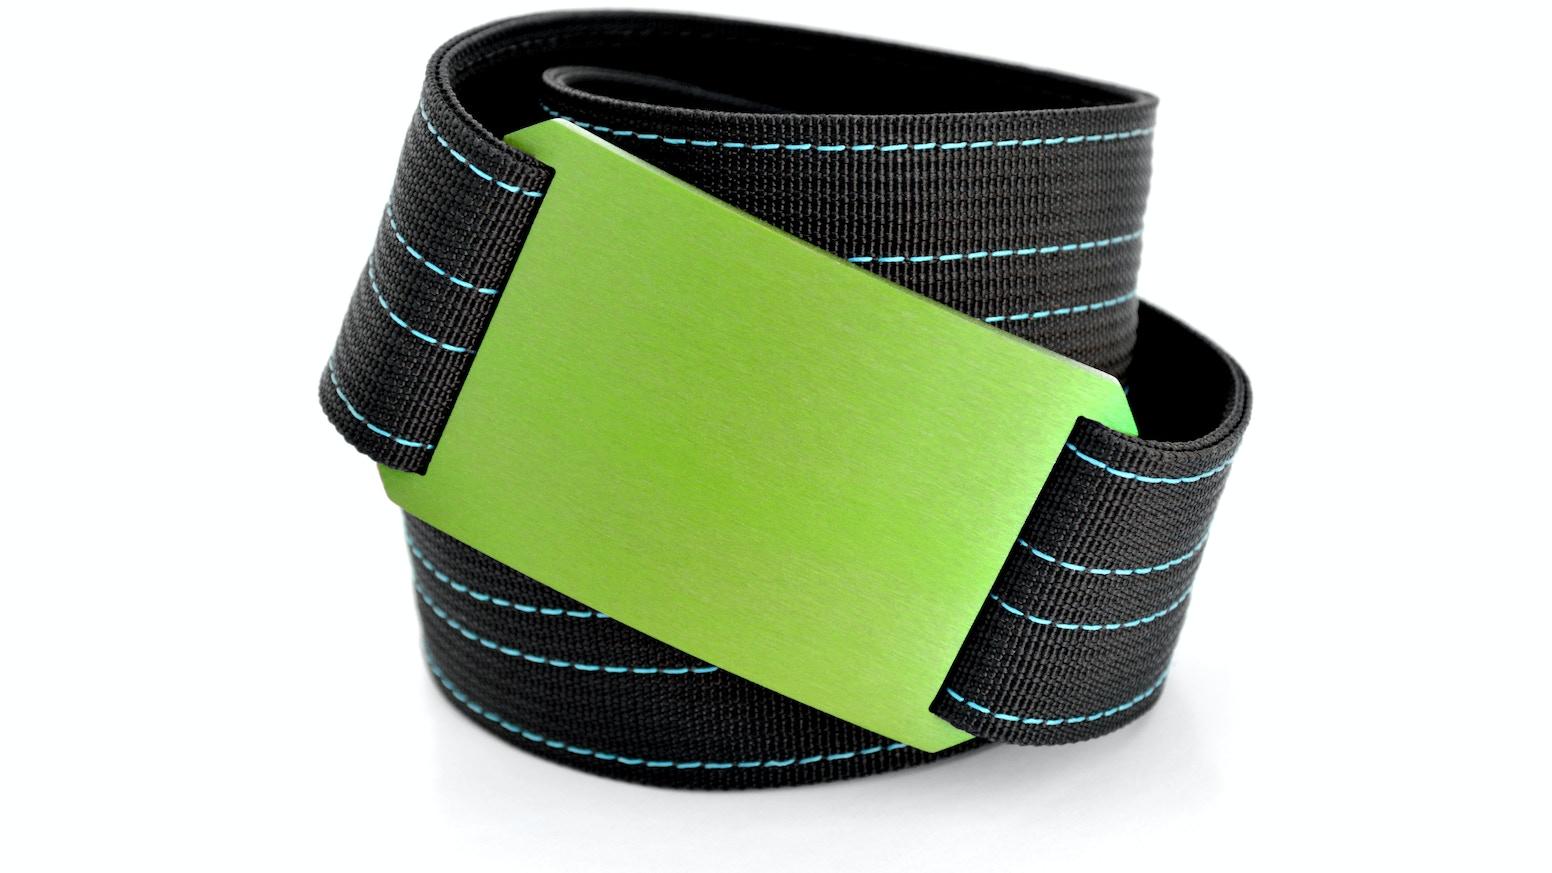 A premium belt designed with no bulk, no holes and no belt flap.